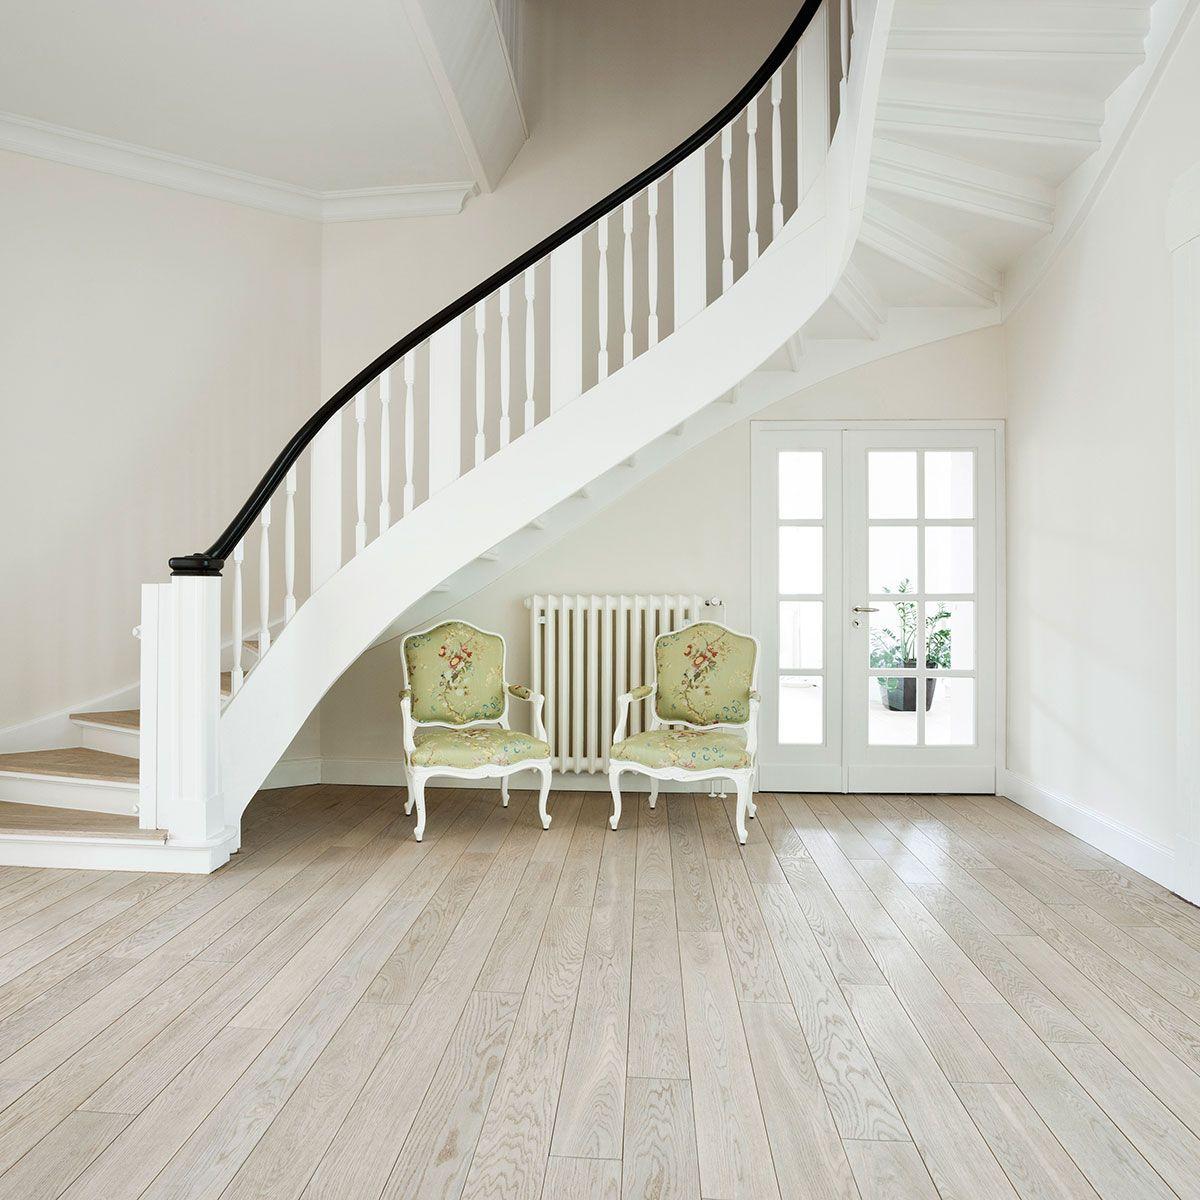 Buying a fantastic floorboard